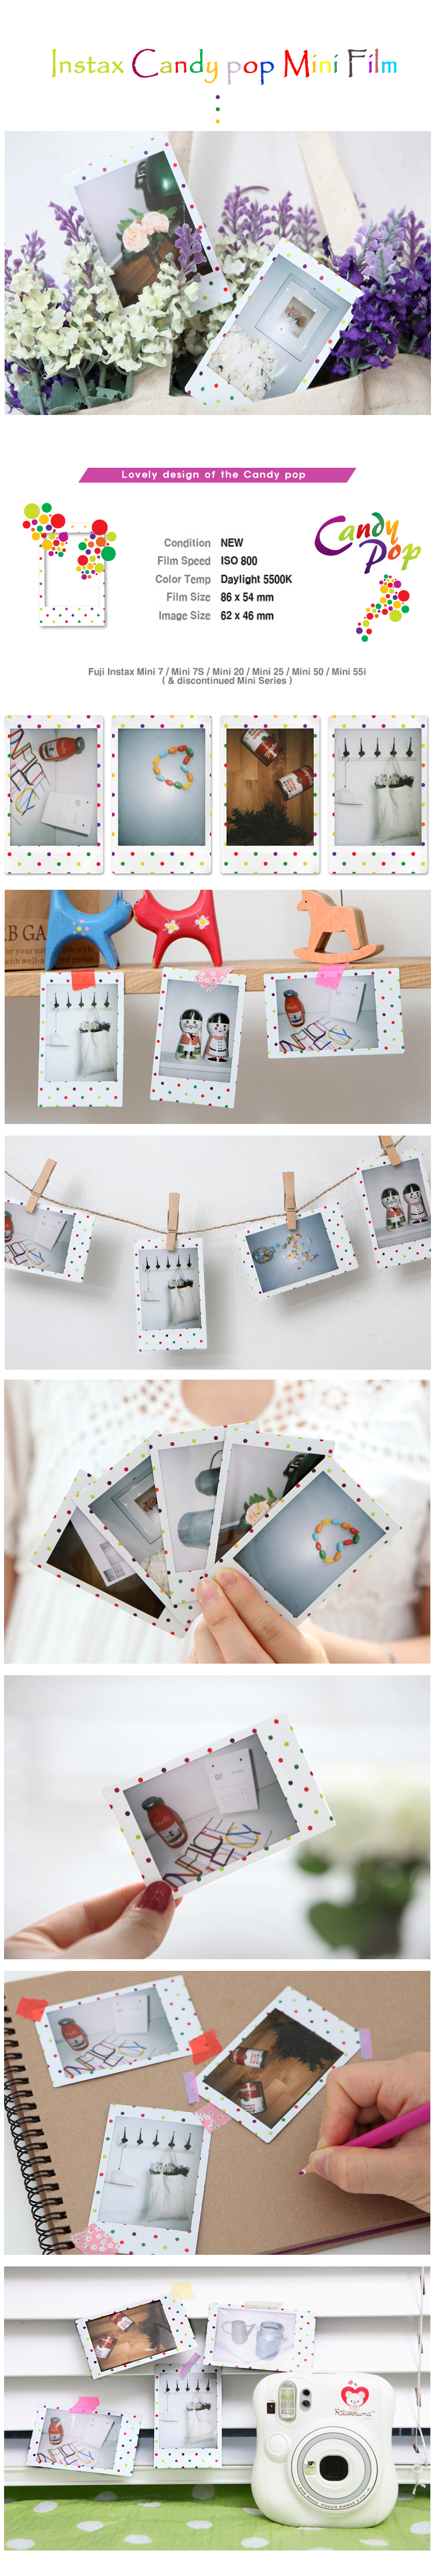 Candy Pop Polaroid Instax